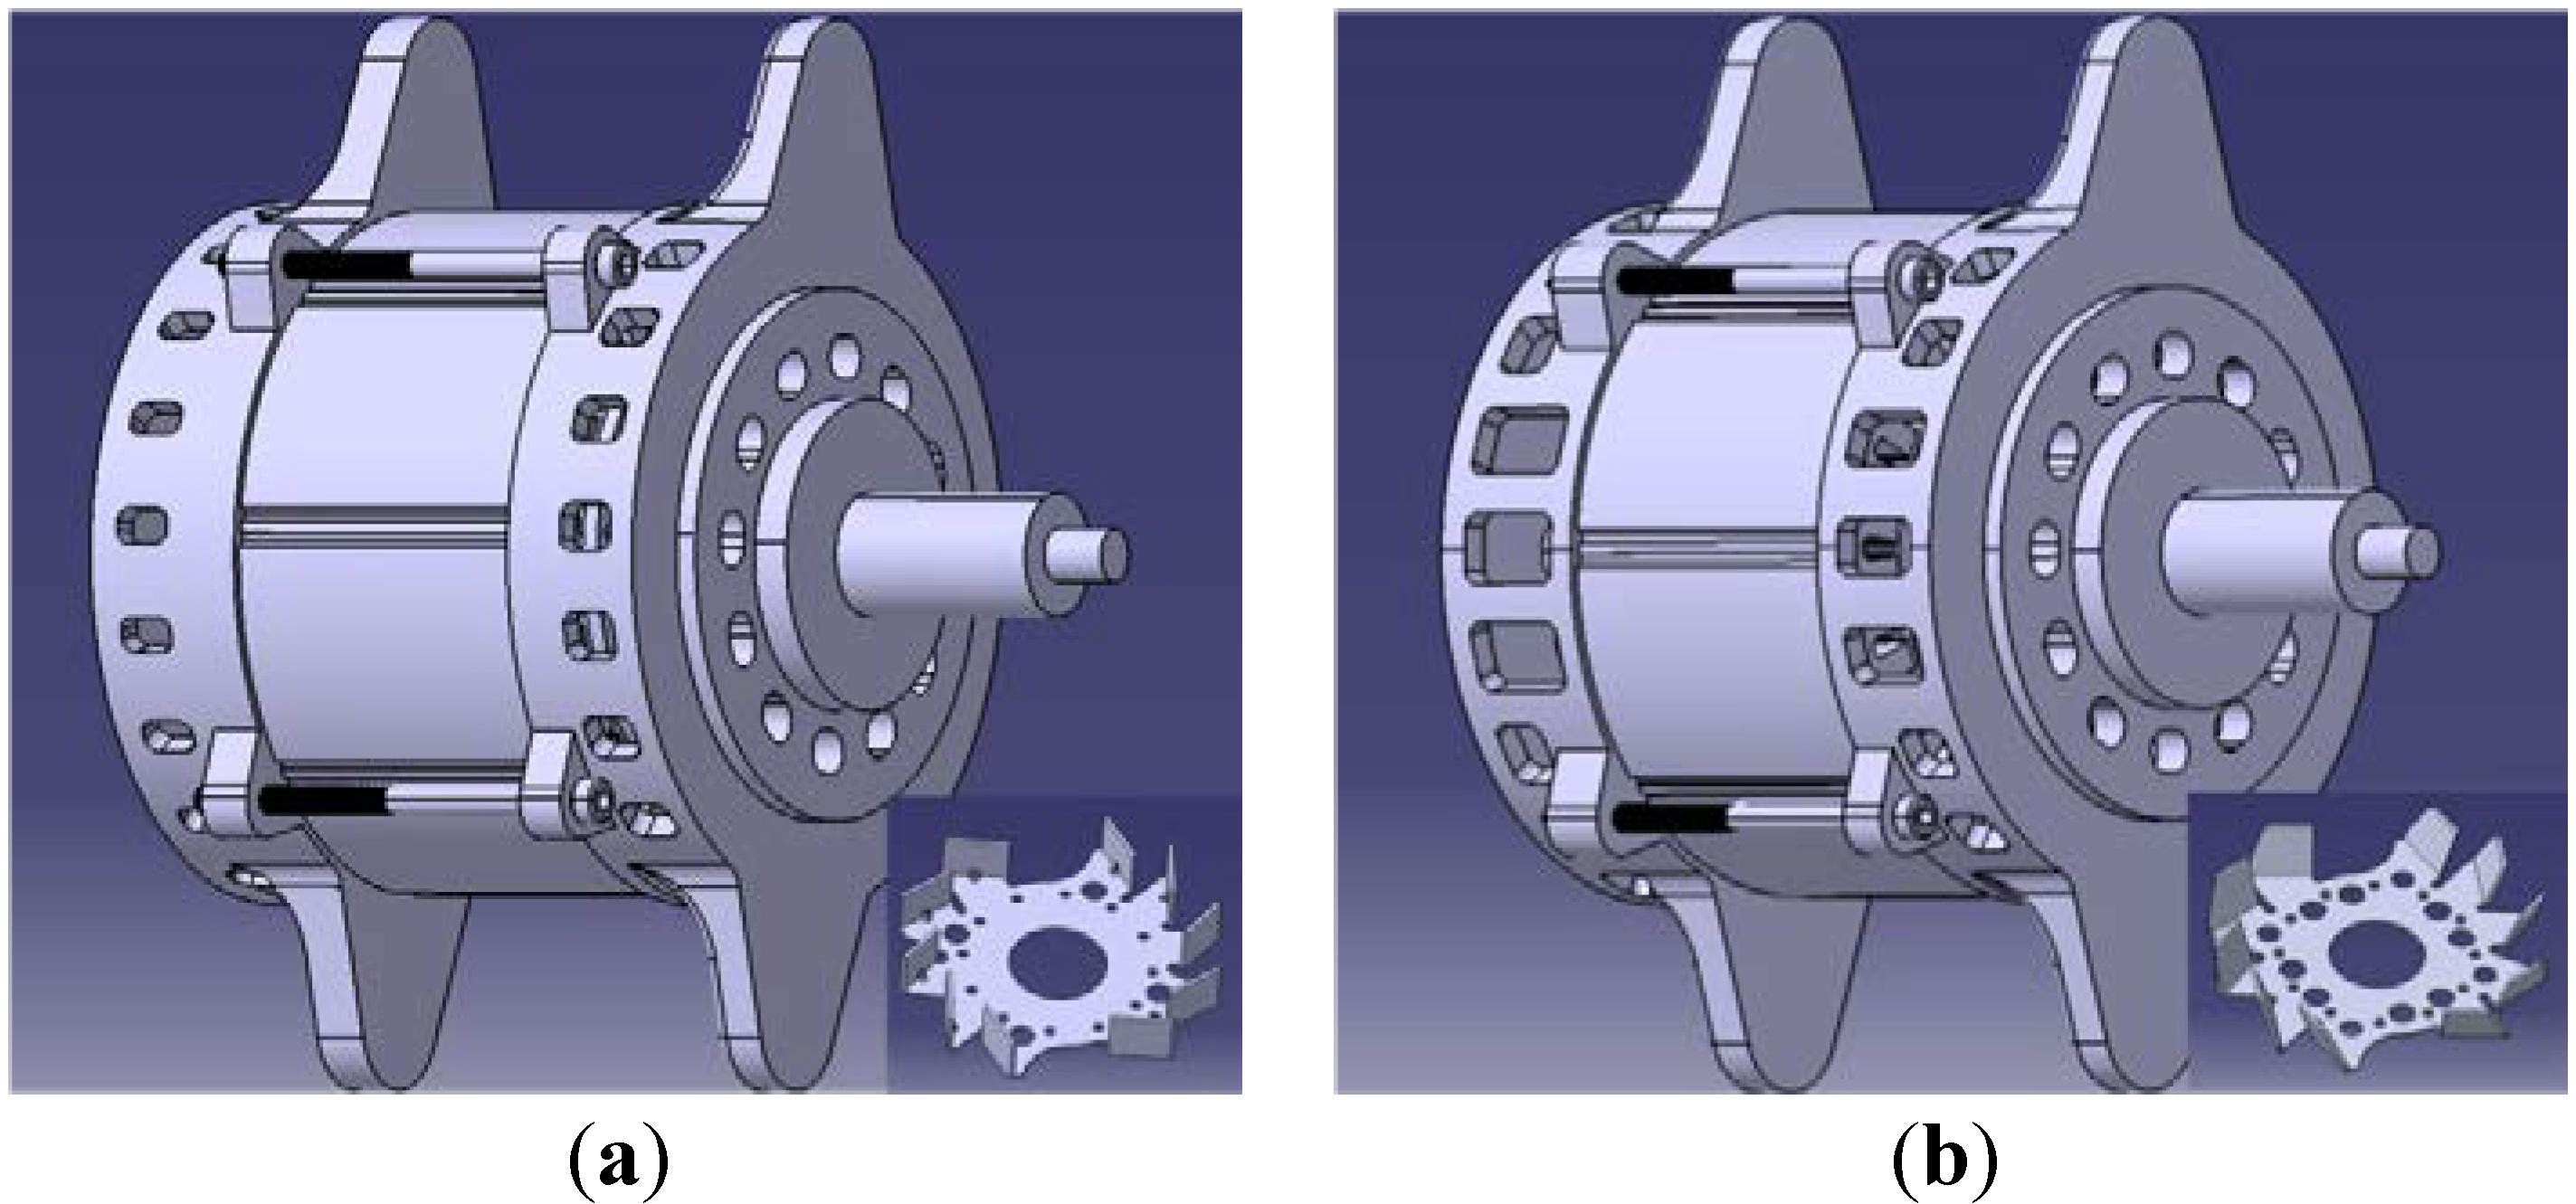 Electric Car Engine Diagram Anoozti Engine Information